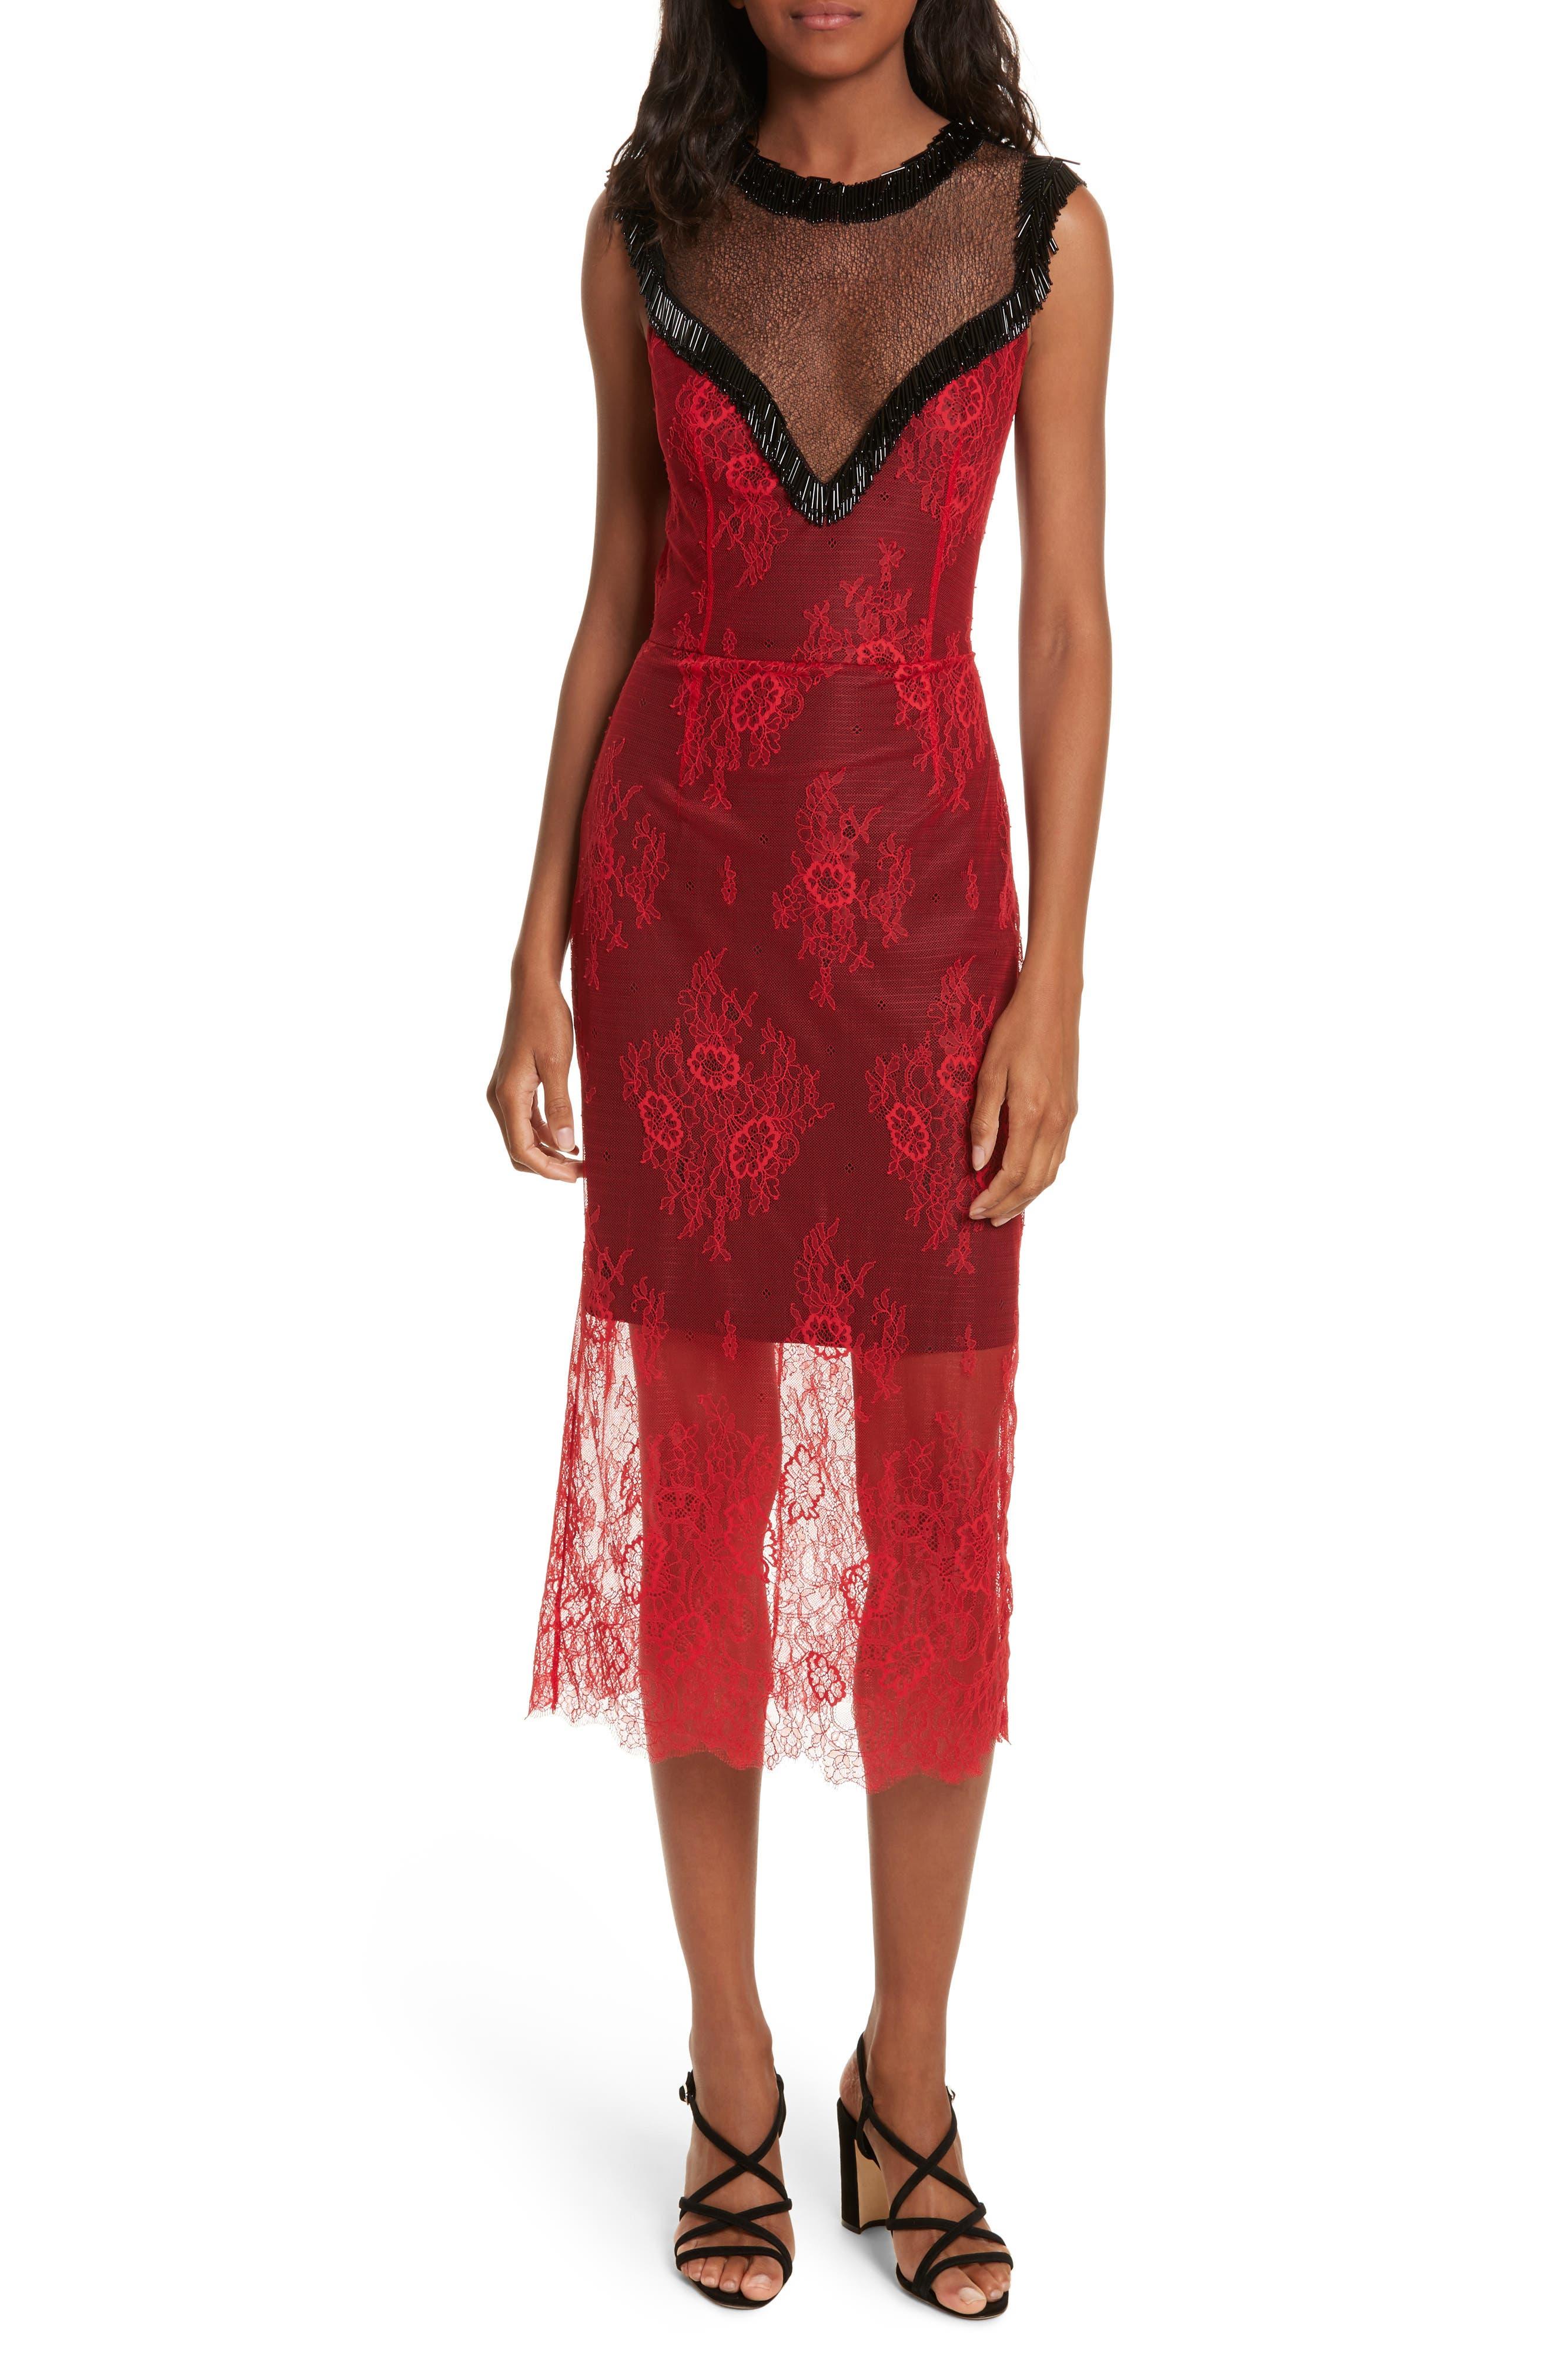 Diane von Furstenberg Beaded Lace Overlay Dress,                             Main thumbnail 1, color,                             Lipstick/ Black